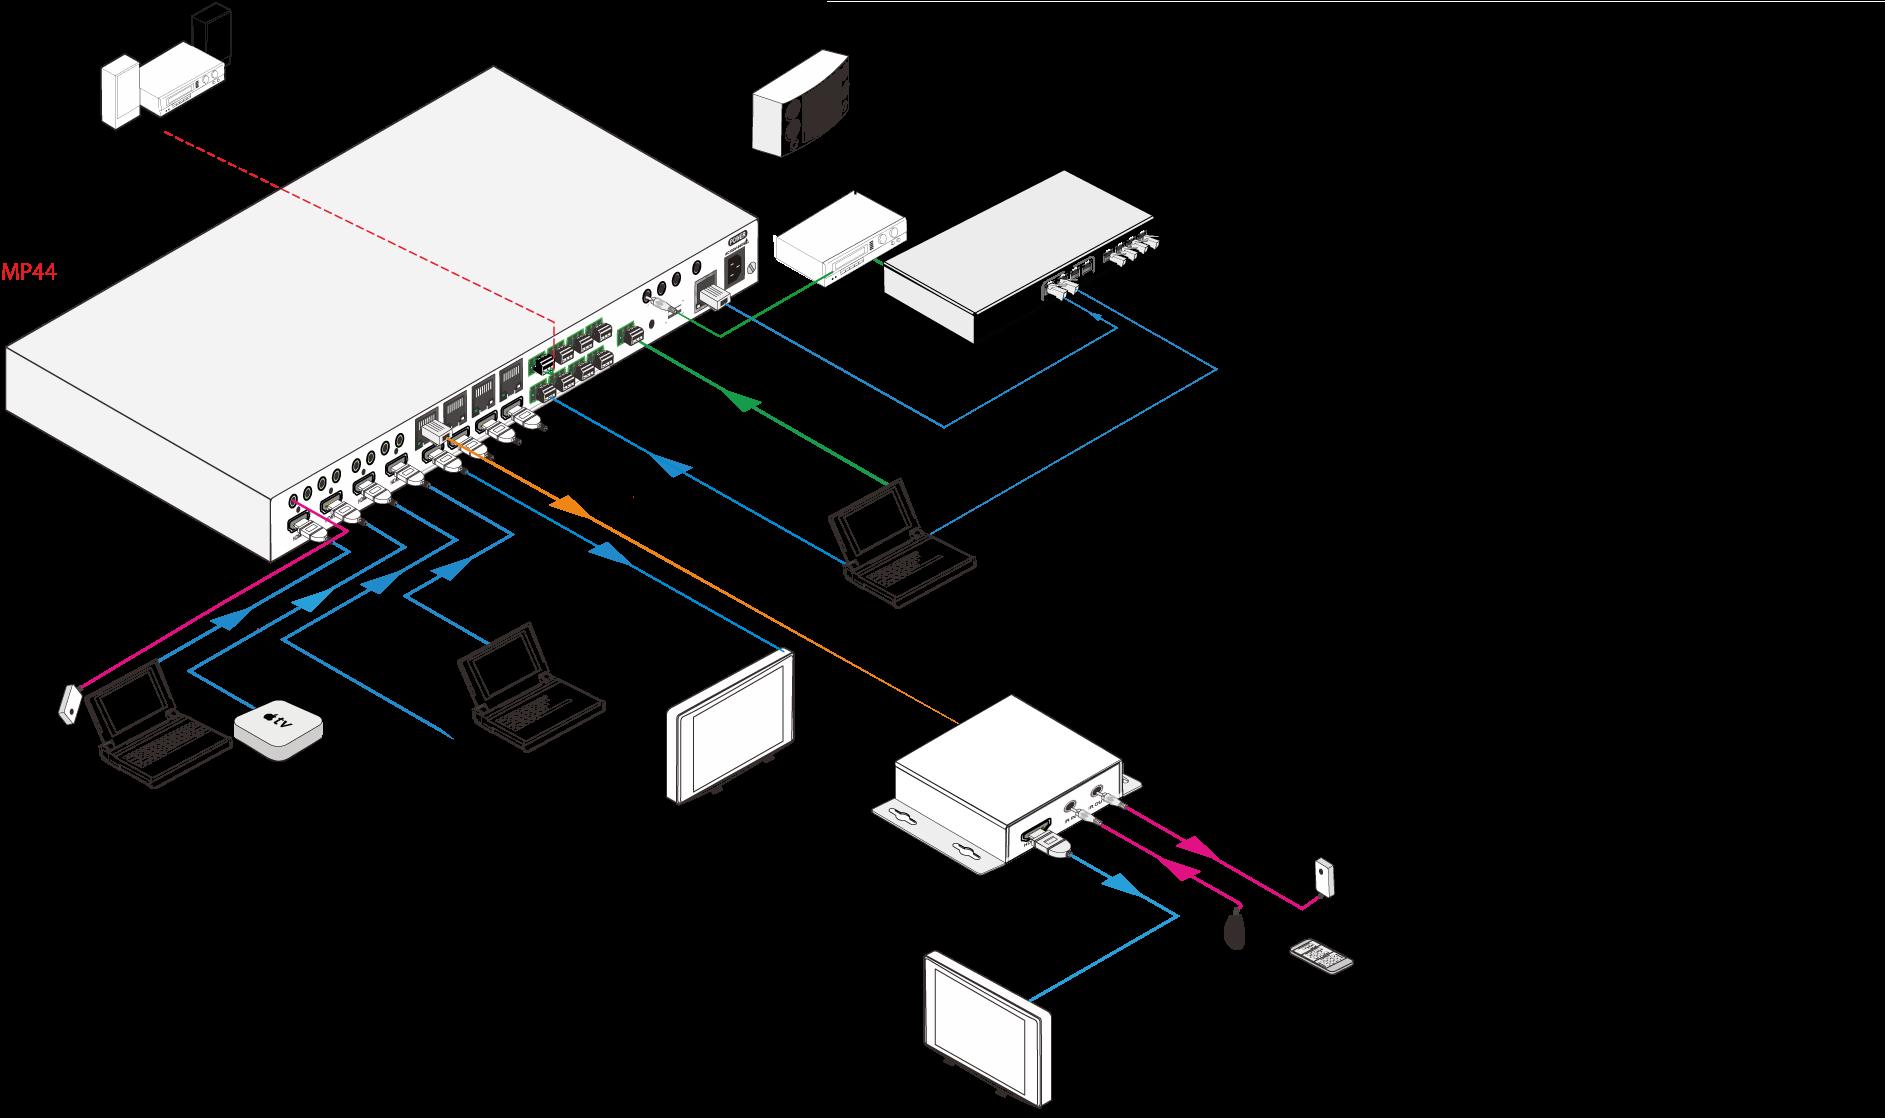 MAT.HDMP44-4K - Matrice HDMI HDBaseT 4x4, 4K@60Hz 4:4:4, HDMI2.0, PoH